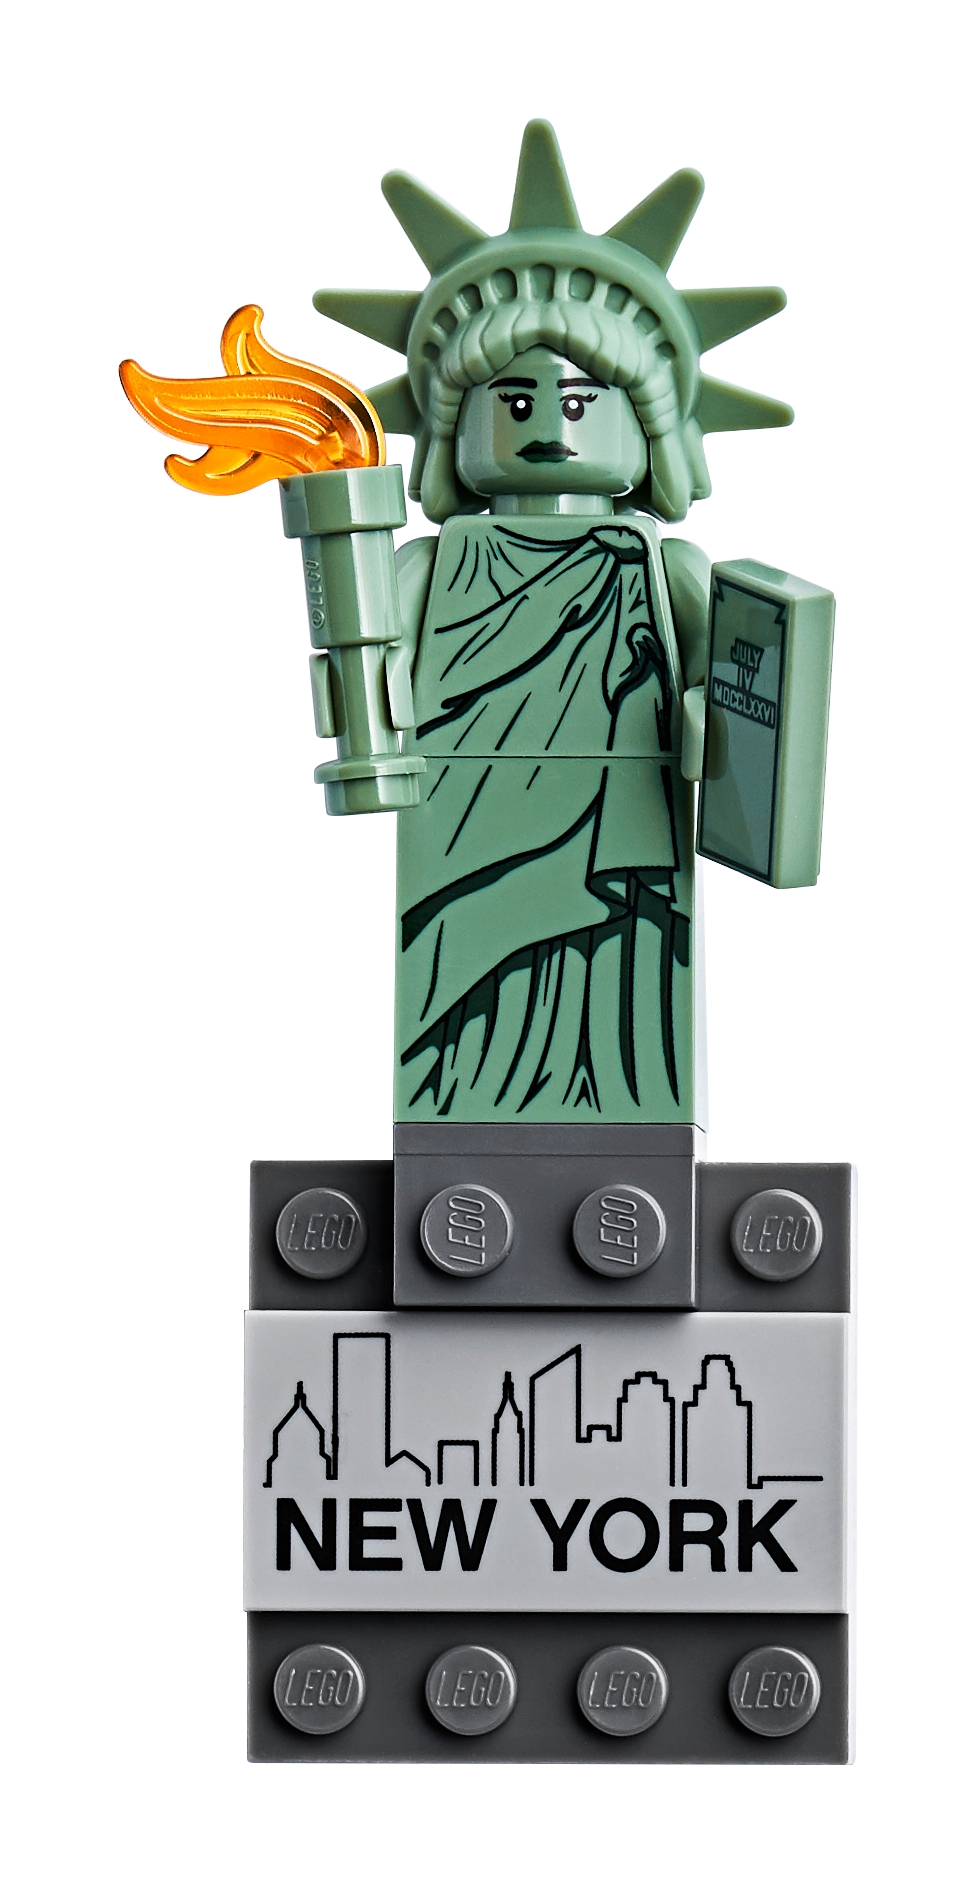 New York City Limit Sign Fridge Magnet